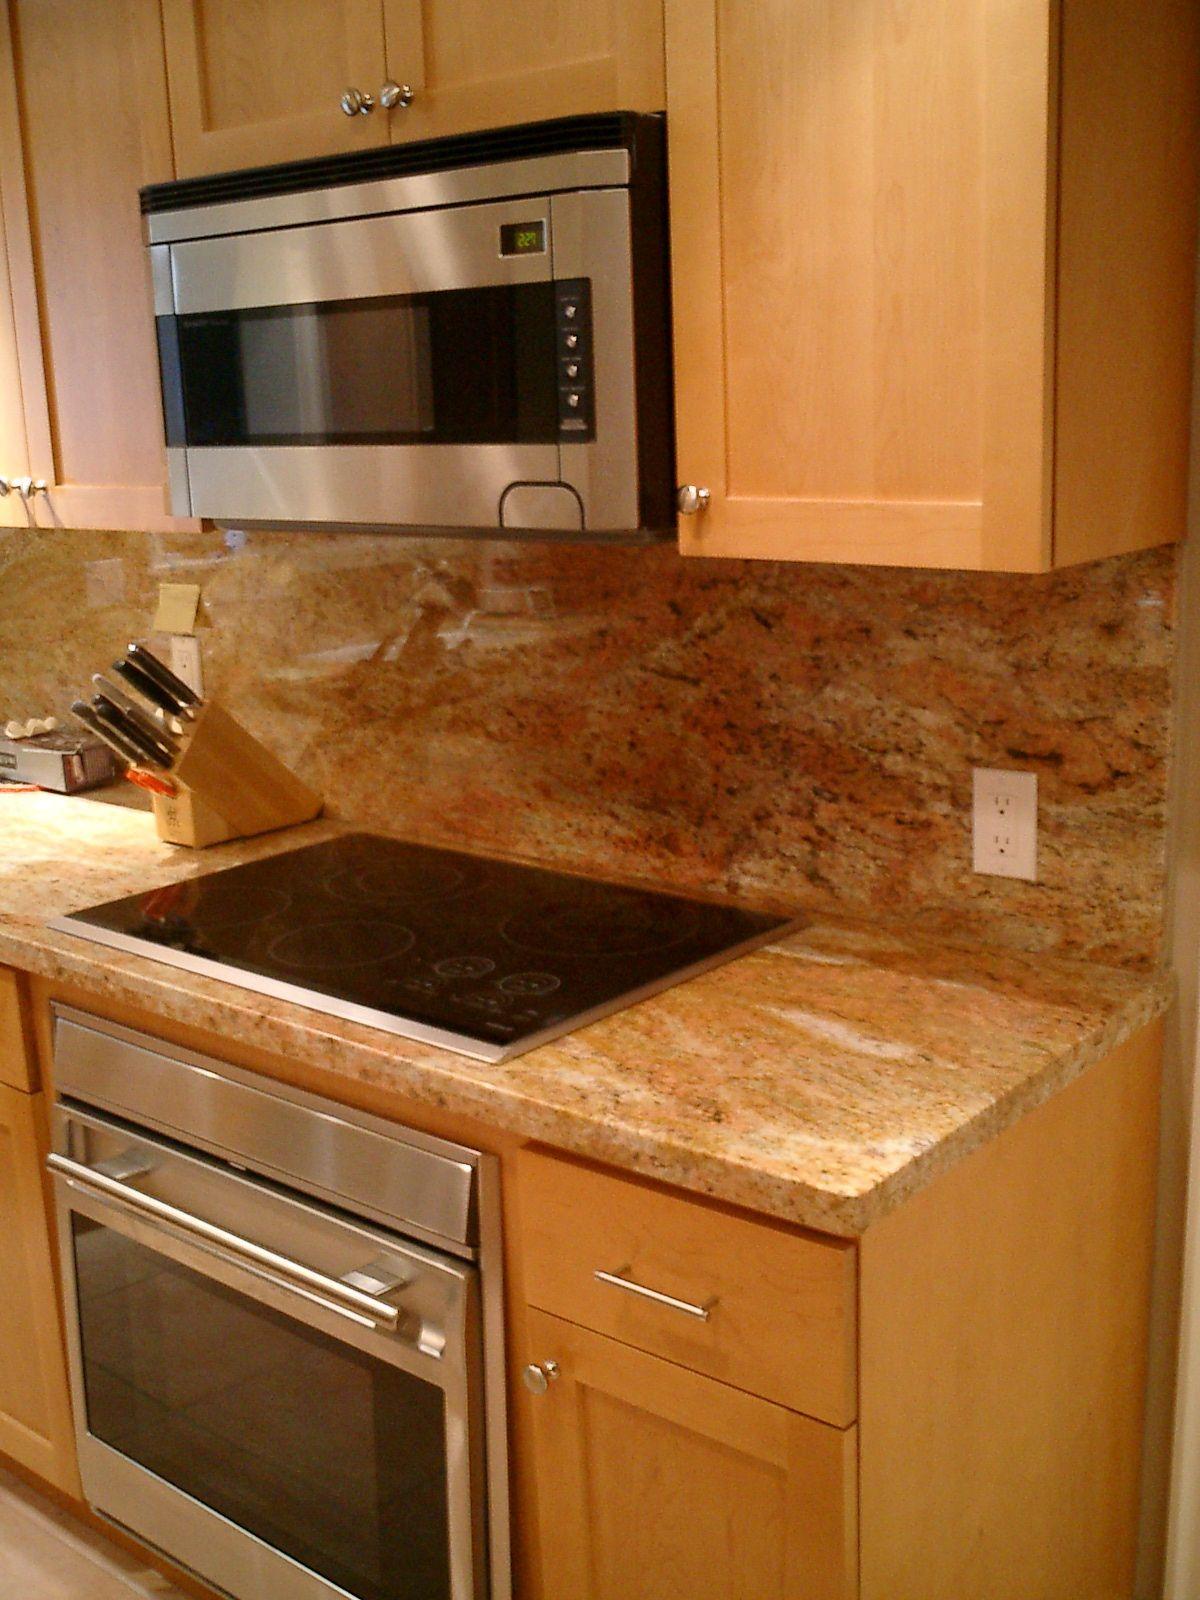 Kitchens-151.jpg